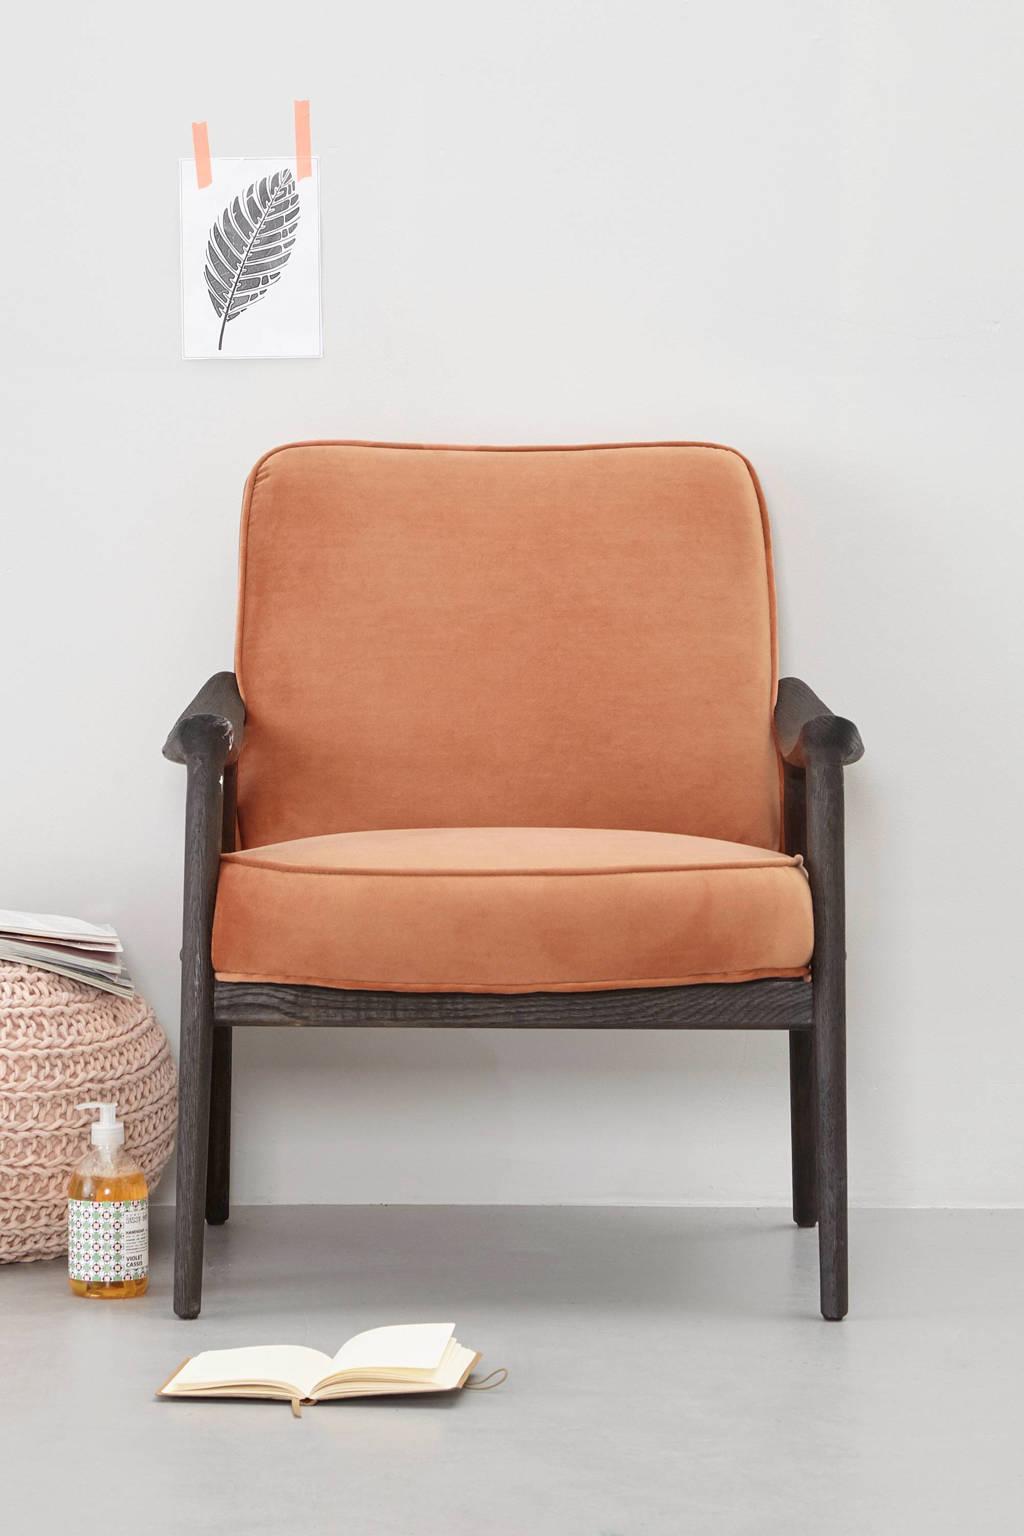 whkmp's own fauteuil Aarhus, Zalm